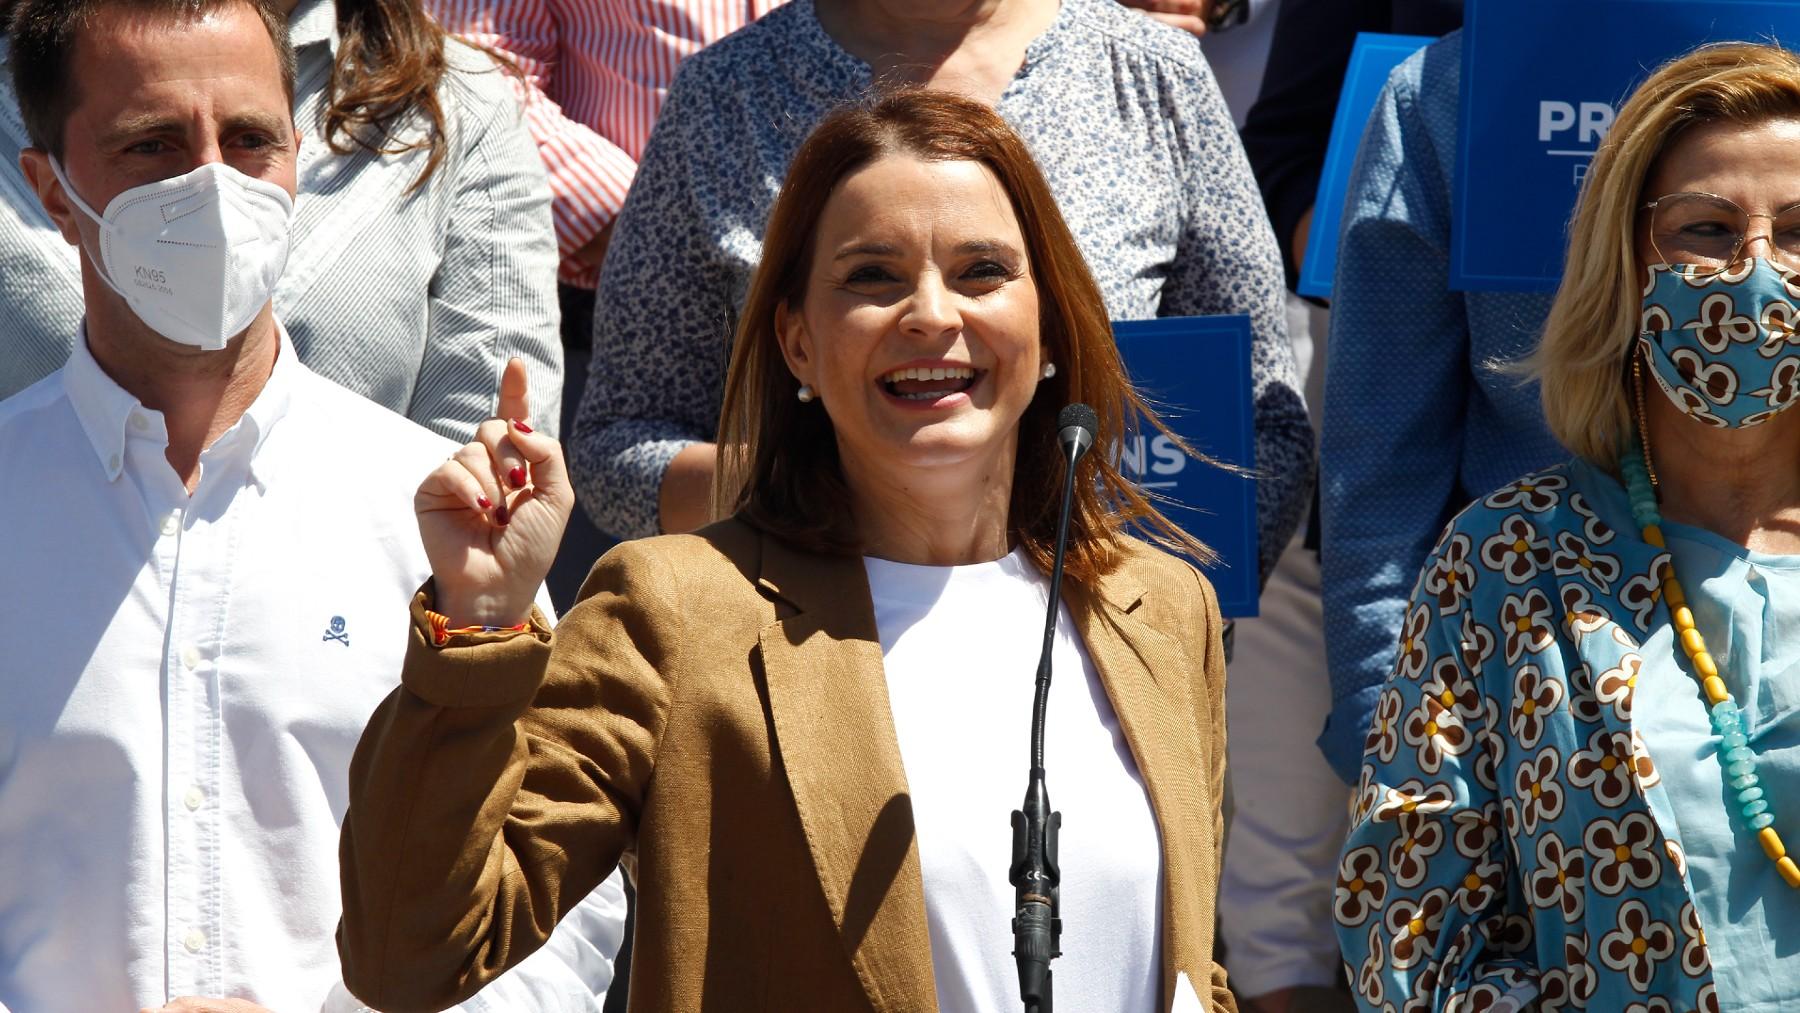 Marga Prohens. (Foto: Europa Press)